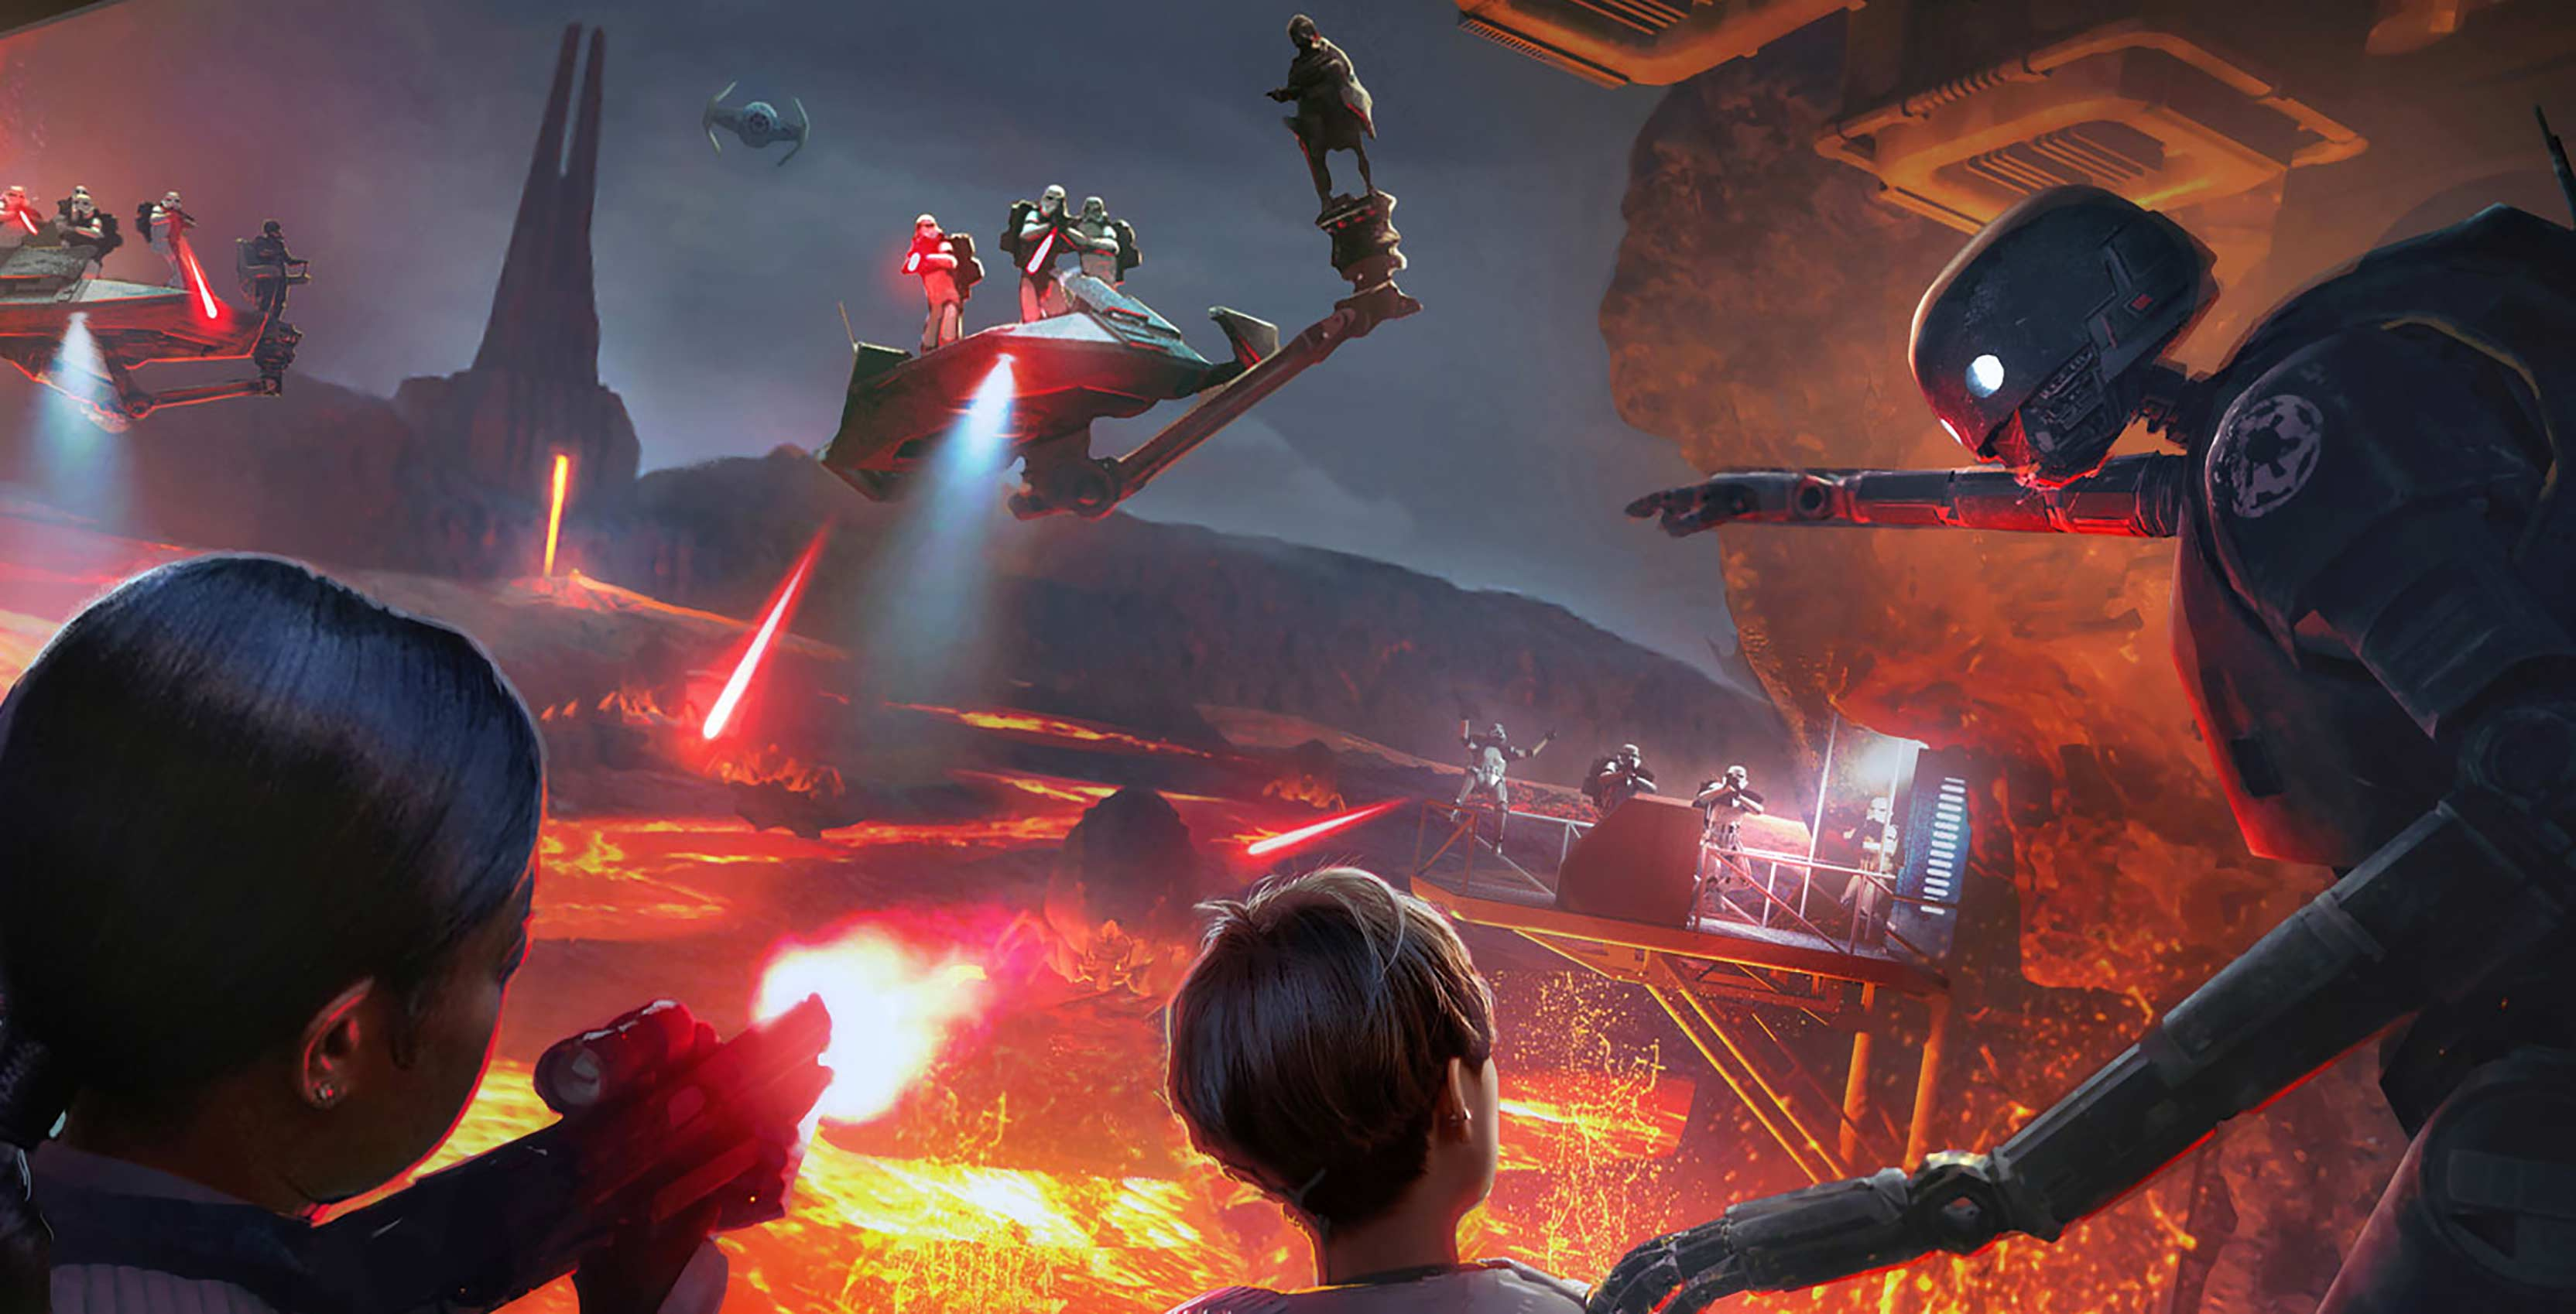 Star Wars Secrets of the Empire concept art